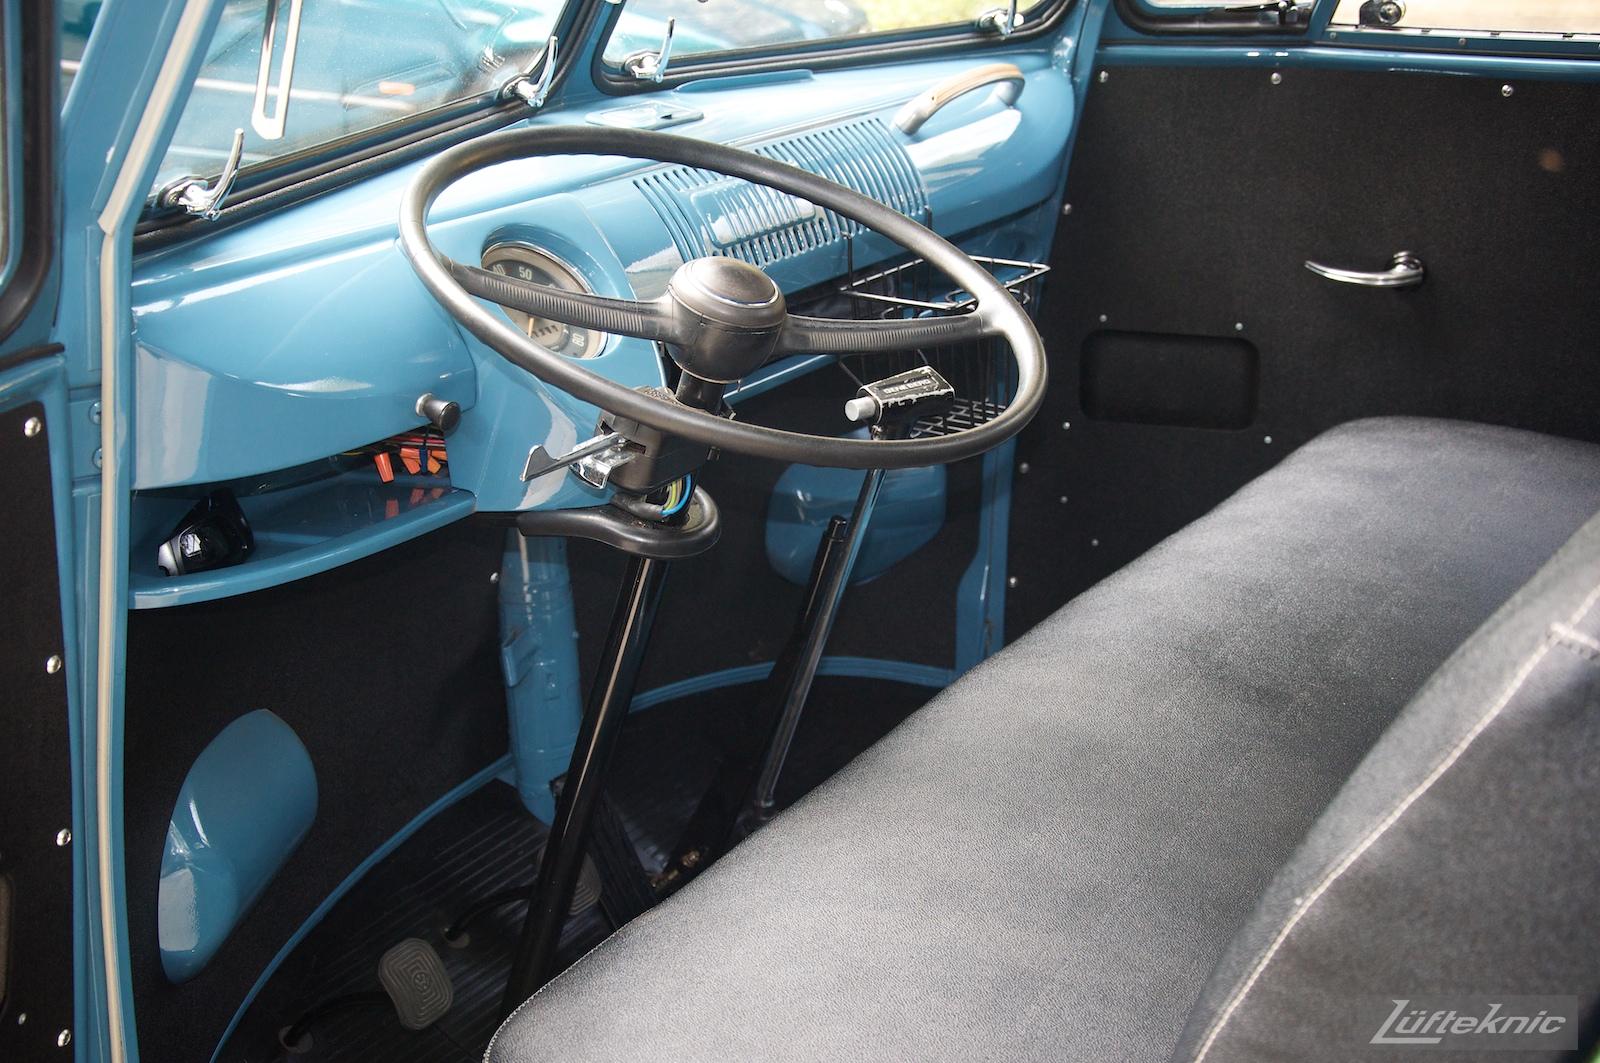 Dove Blue single cab VW Transporter with Lufteknic graphics.